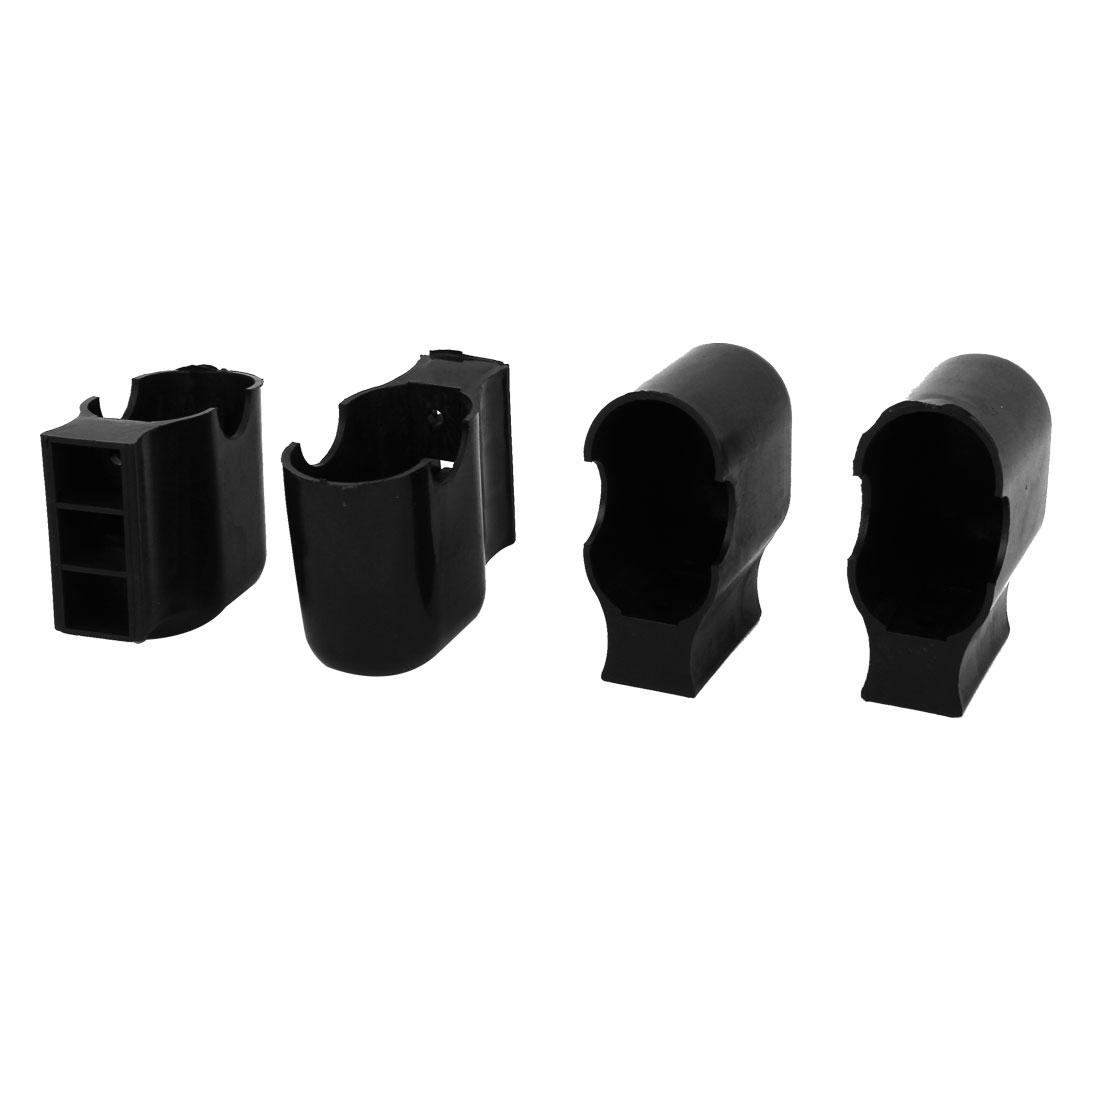 4Pcs Oval Shaped Plastic Furniture Foot Leg Corner Protector Pad 30mmx50mm Black